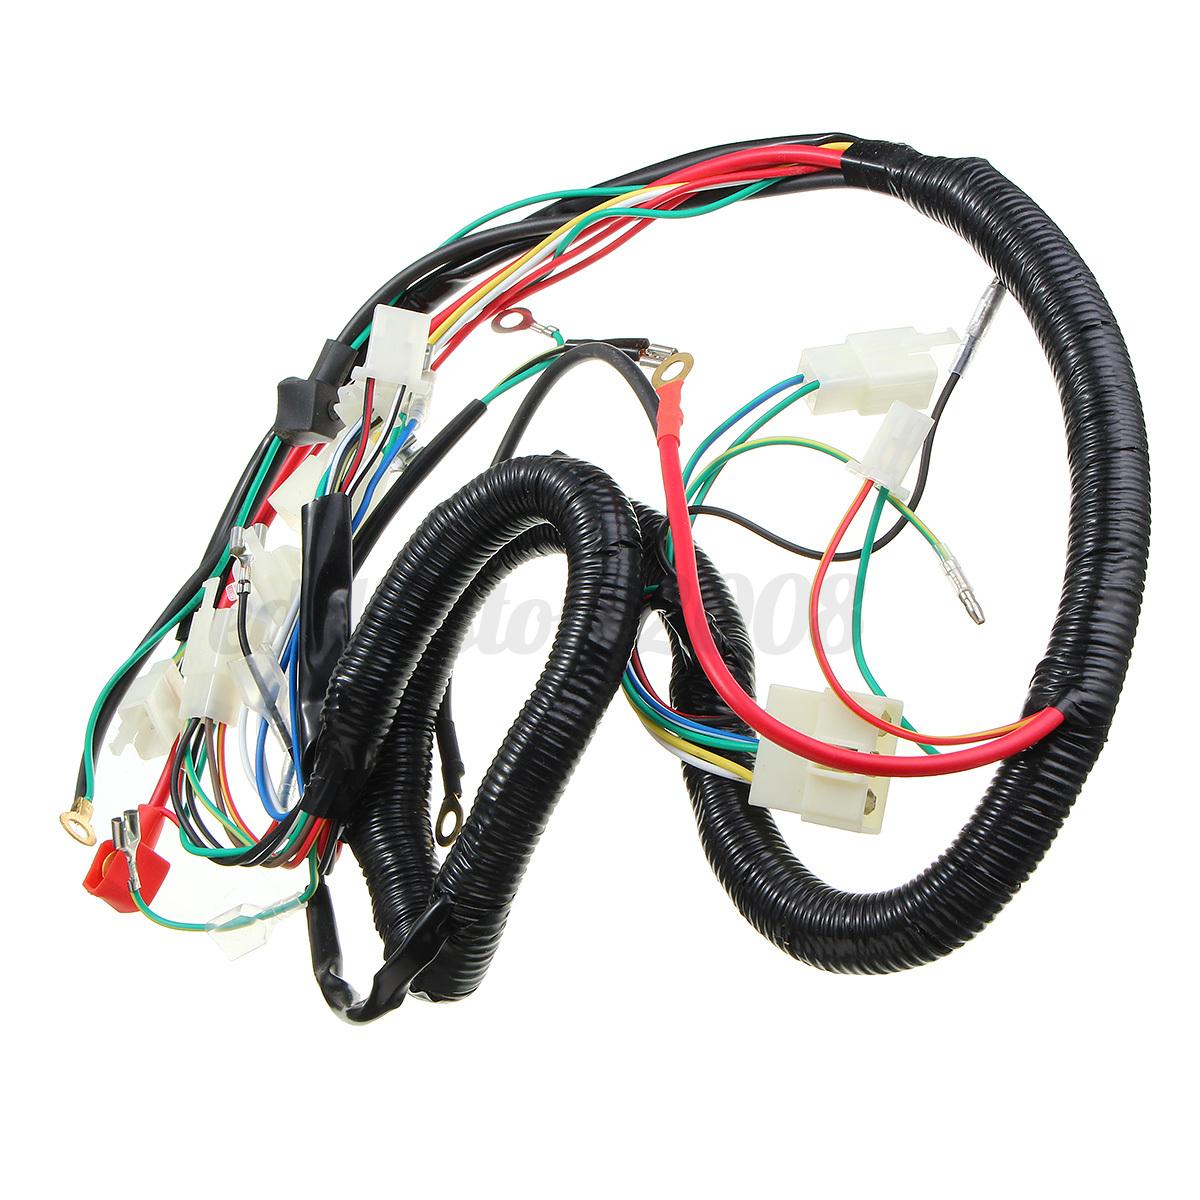 125 150 200 250cc cdi wire harness stator assembly wiring set atv 125 150 200 250cc cdi wire harness stator